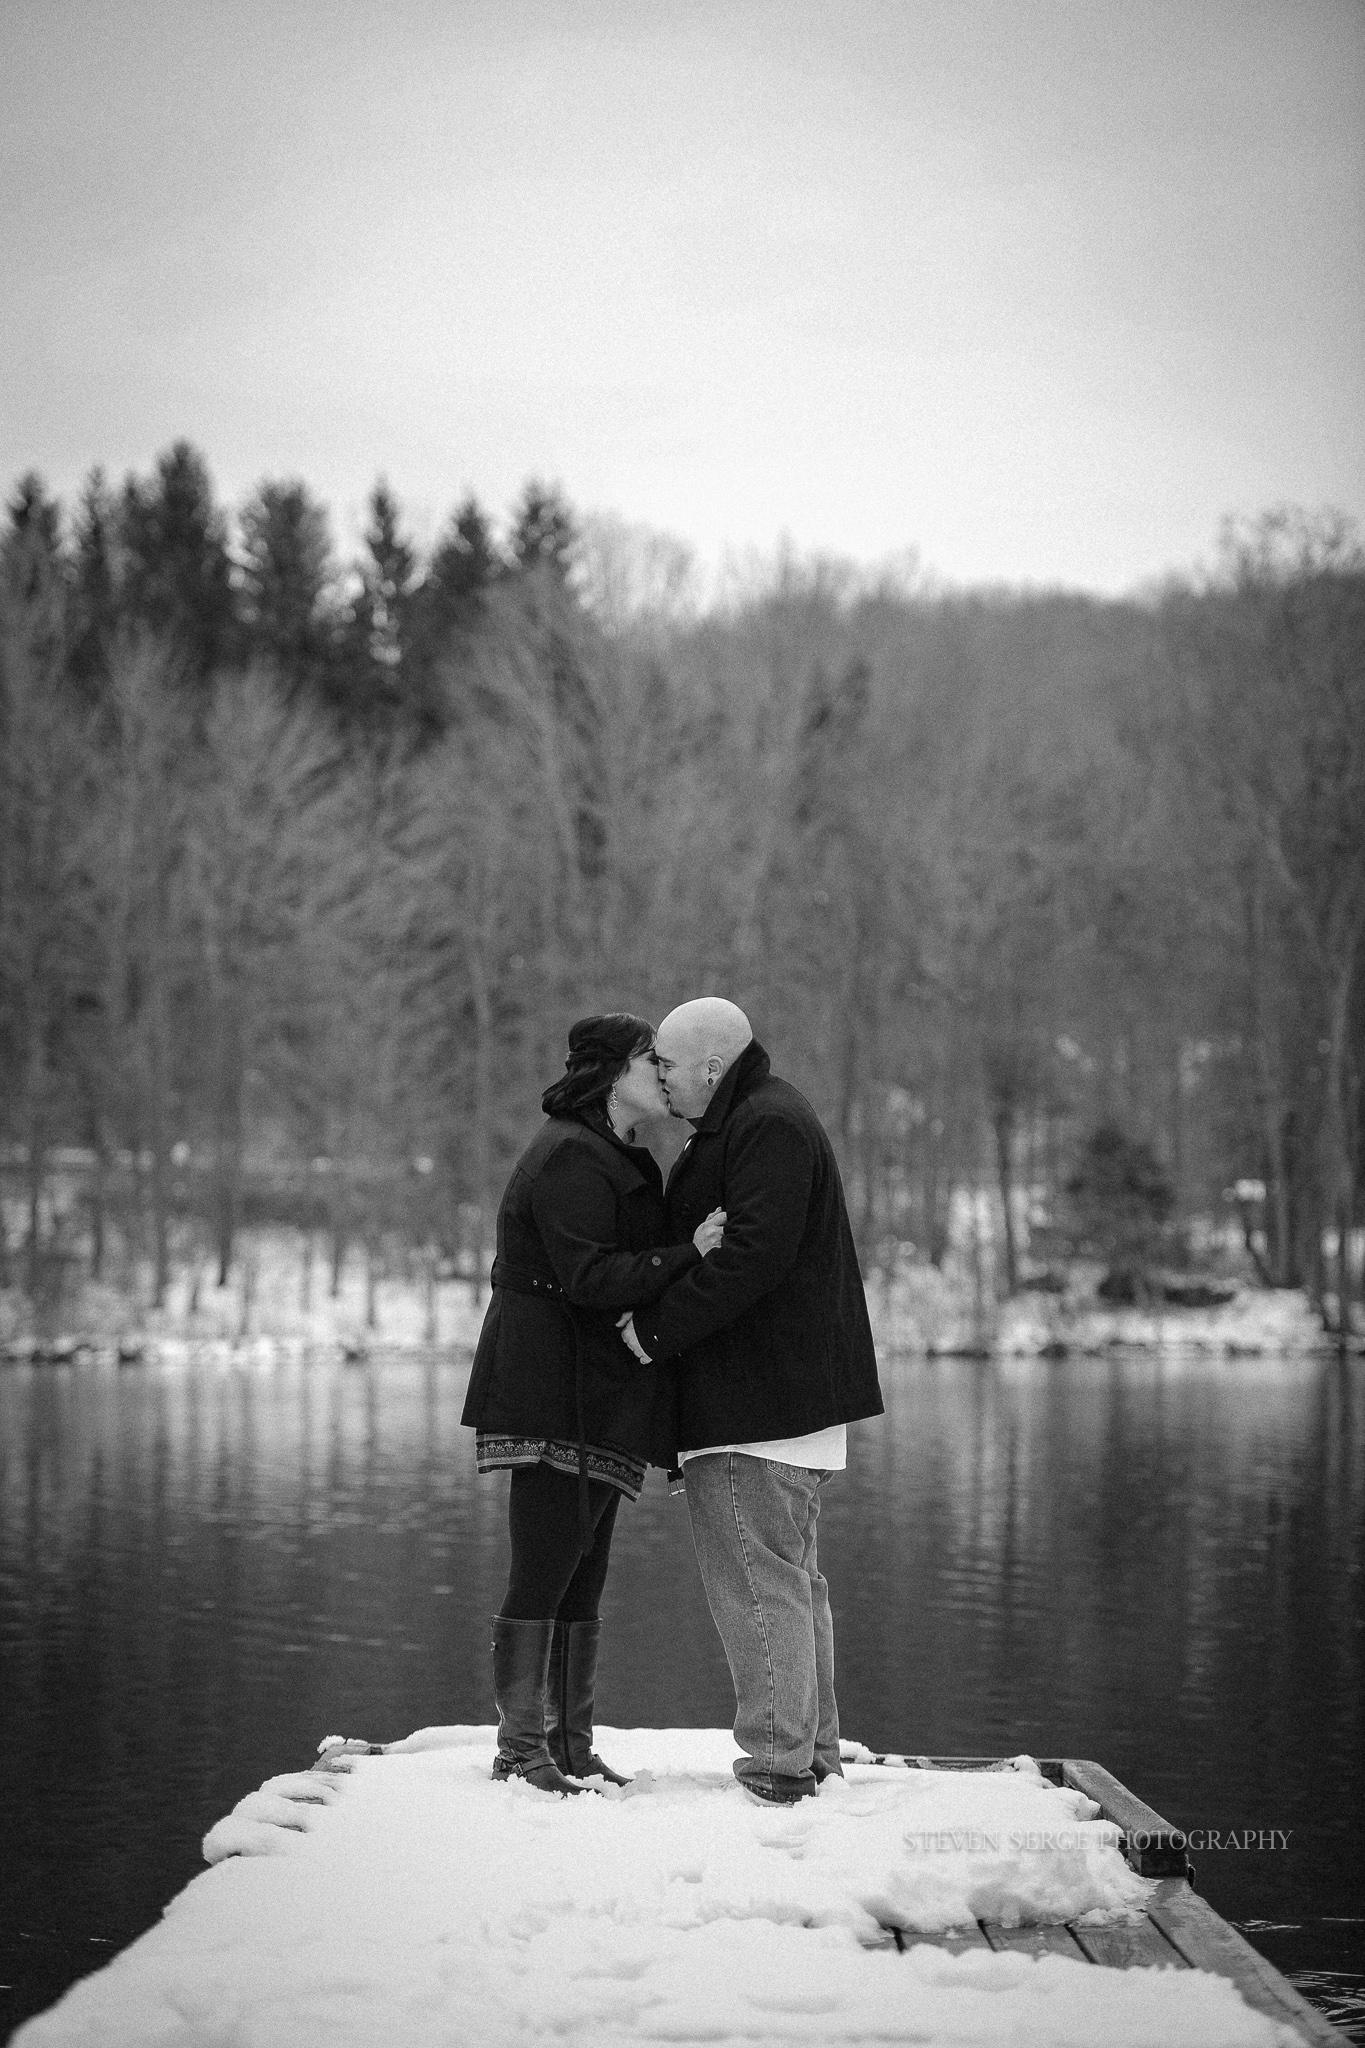 Rosa-NEPA-Wedding-Engagement-Photographer-Waverly-Clarks-Summit-Scranton-Photographer-5.jpg